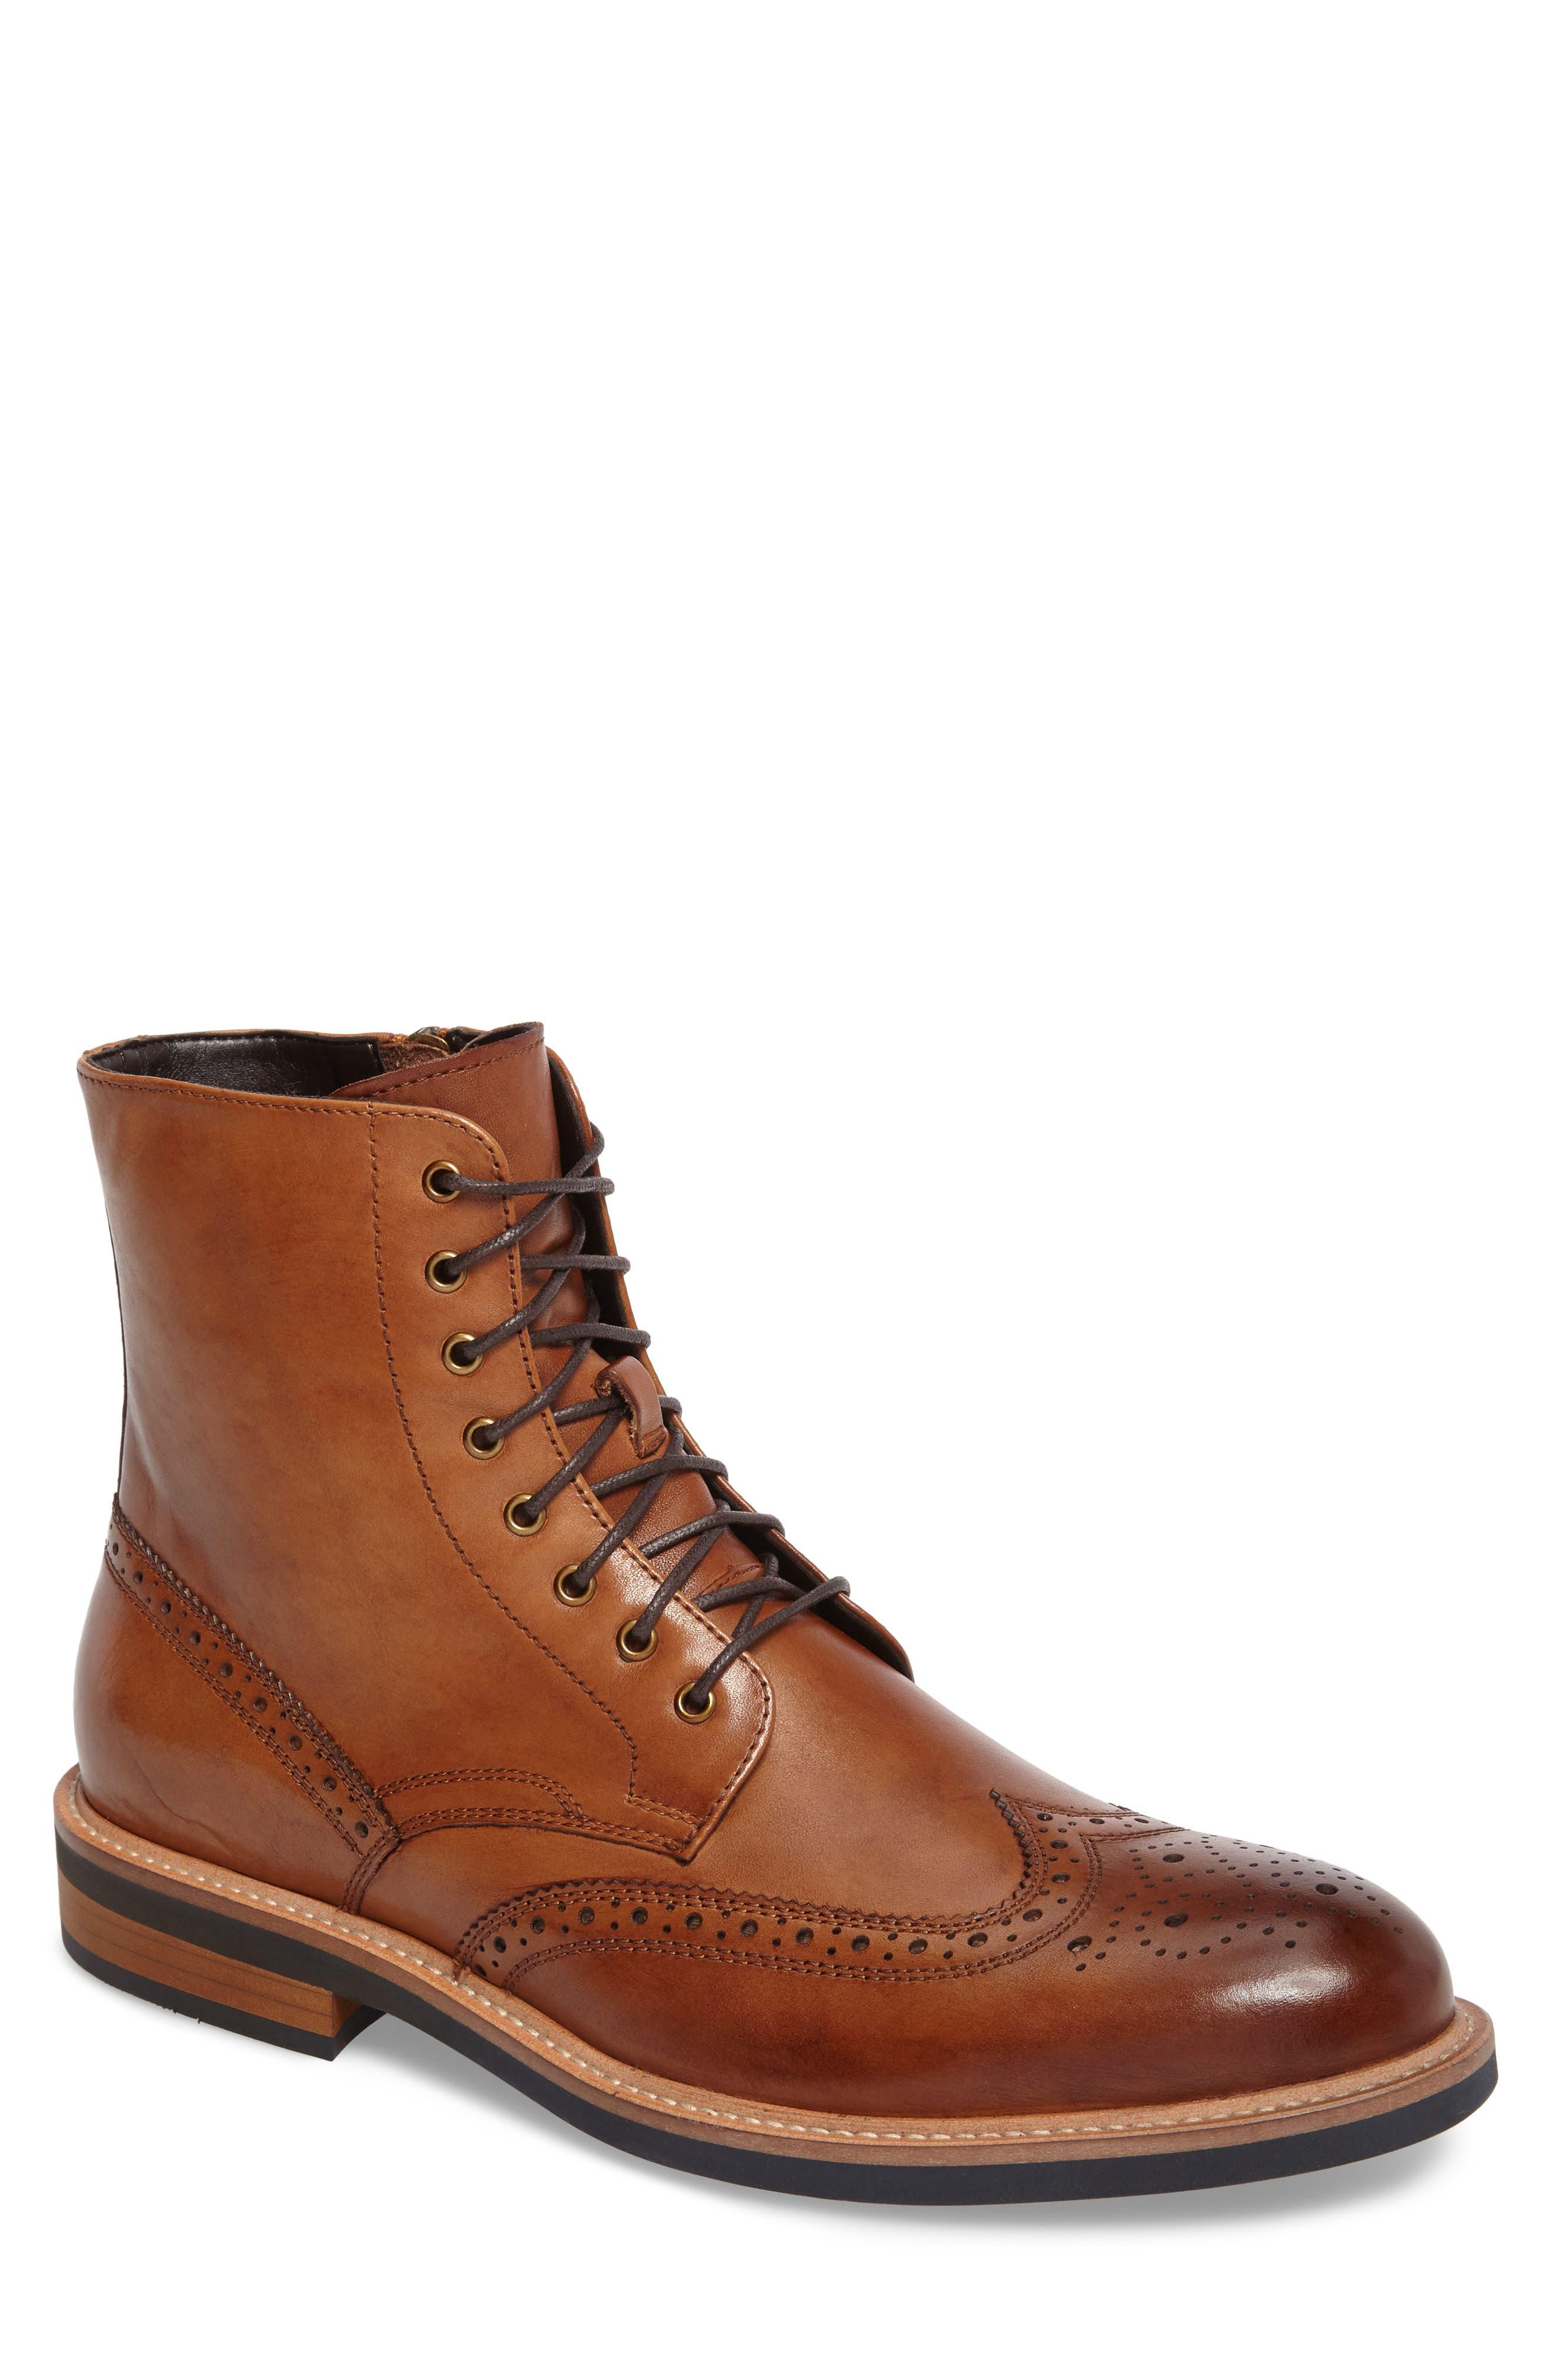 Kenneth Cole Reaction Wingtip Boot,                         Main,                         color, Cognac